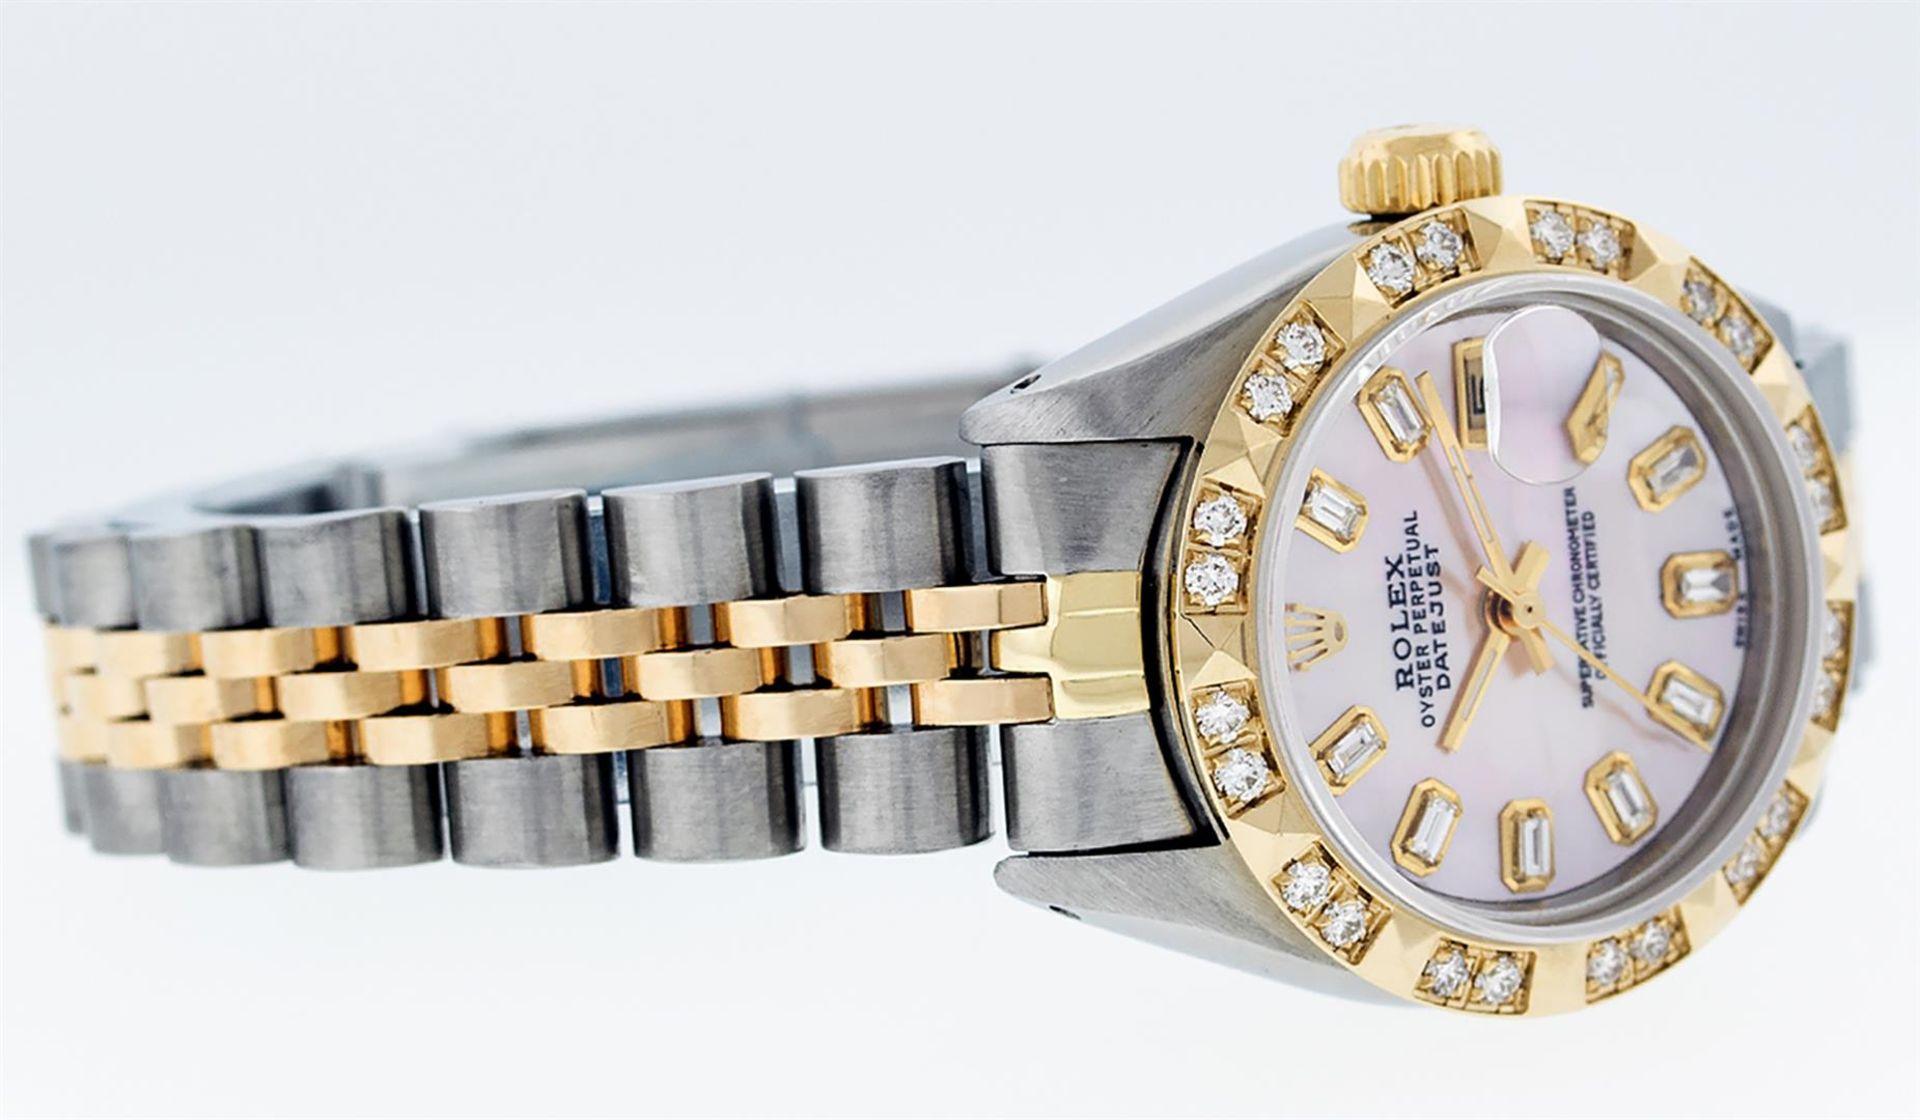 Rolex Ladies 26 2T Pink MOP Baguette 18K YG Diamond Bezel Serviced And Polished - Image 6 of 9